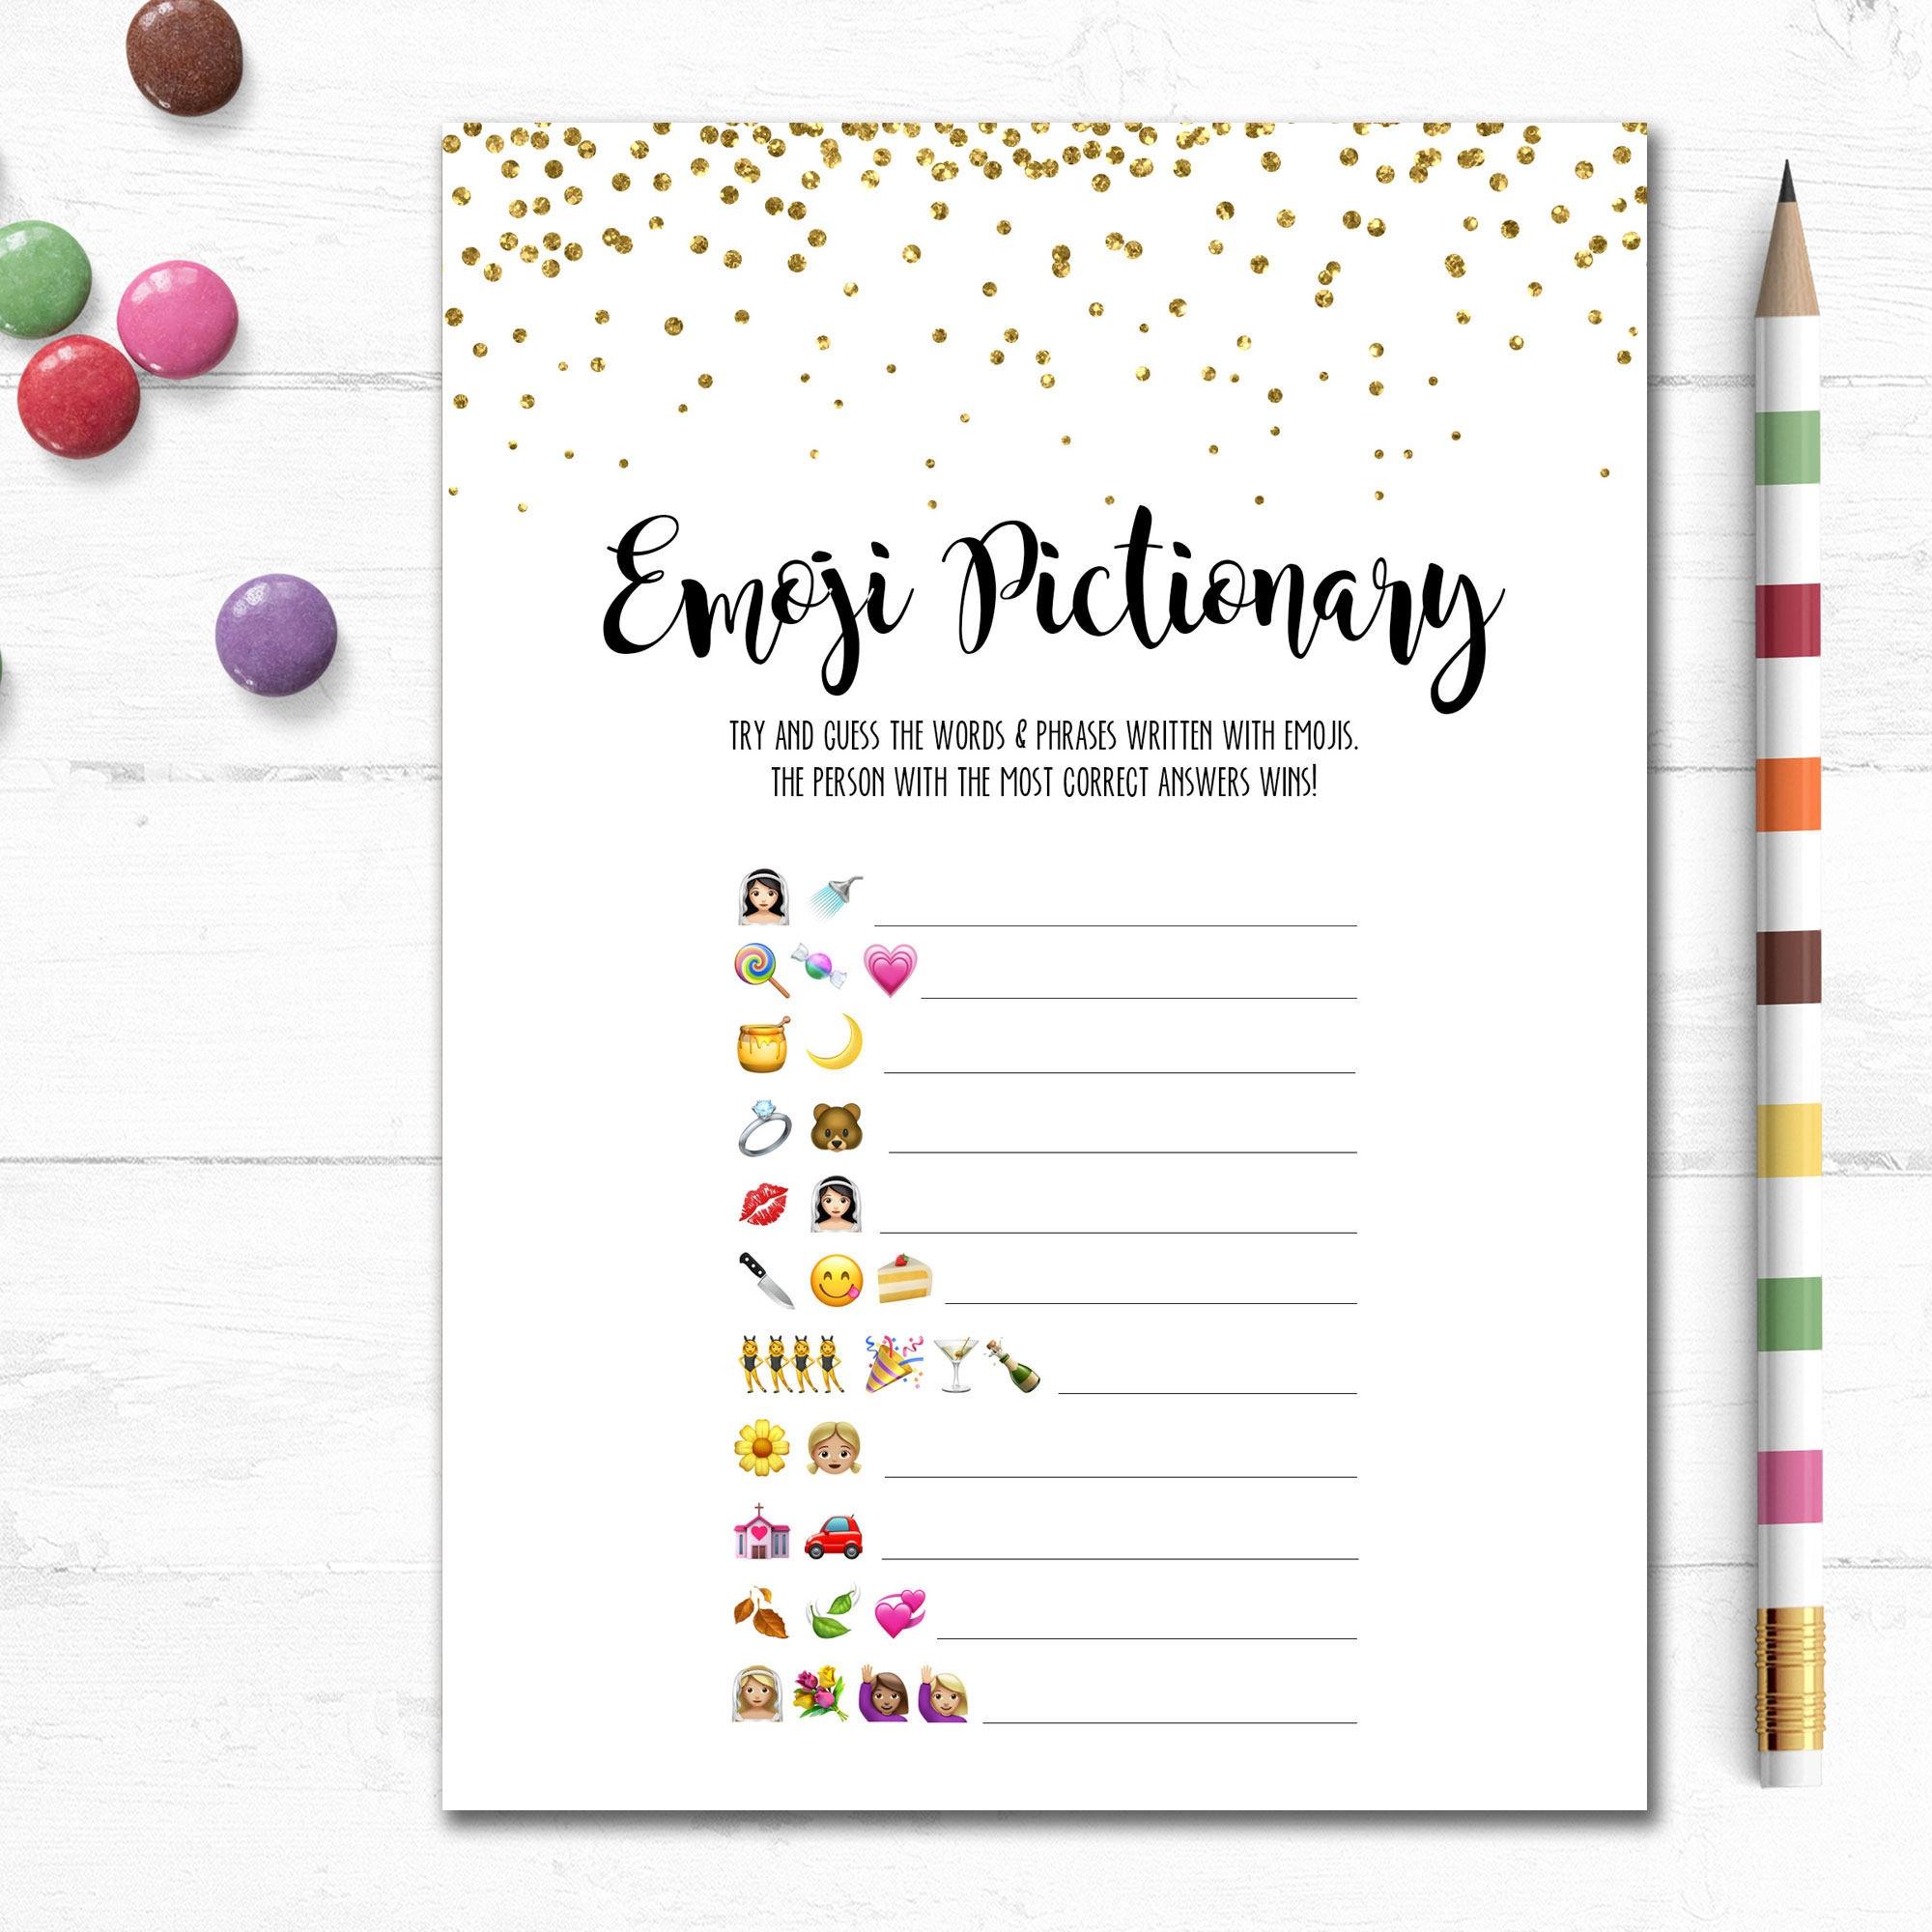 Printable Wedding Emoji Pictionary Bridal Shower Game Bridal   Etsy - Wedding Emoji Pictionary Free Printable